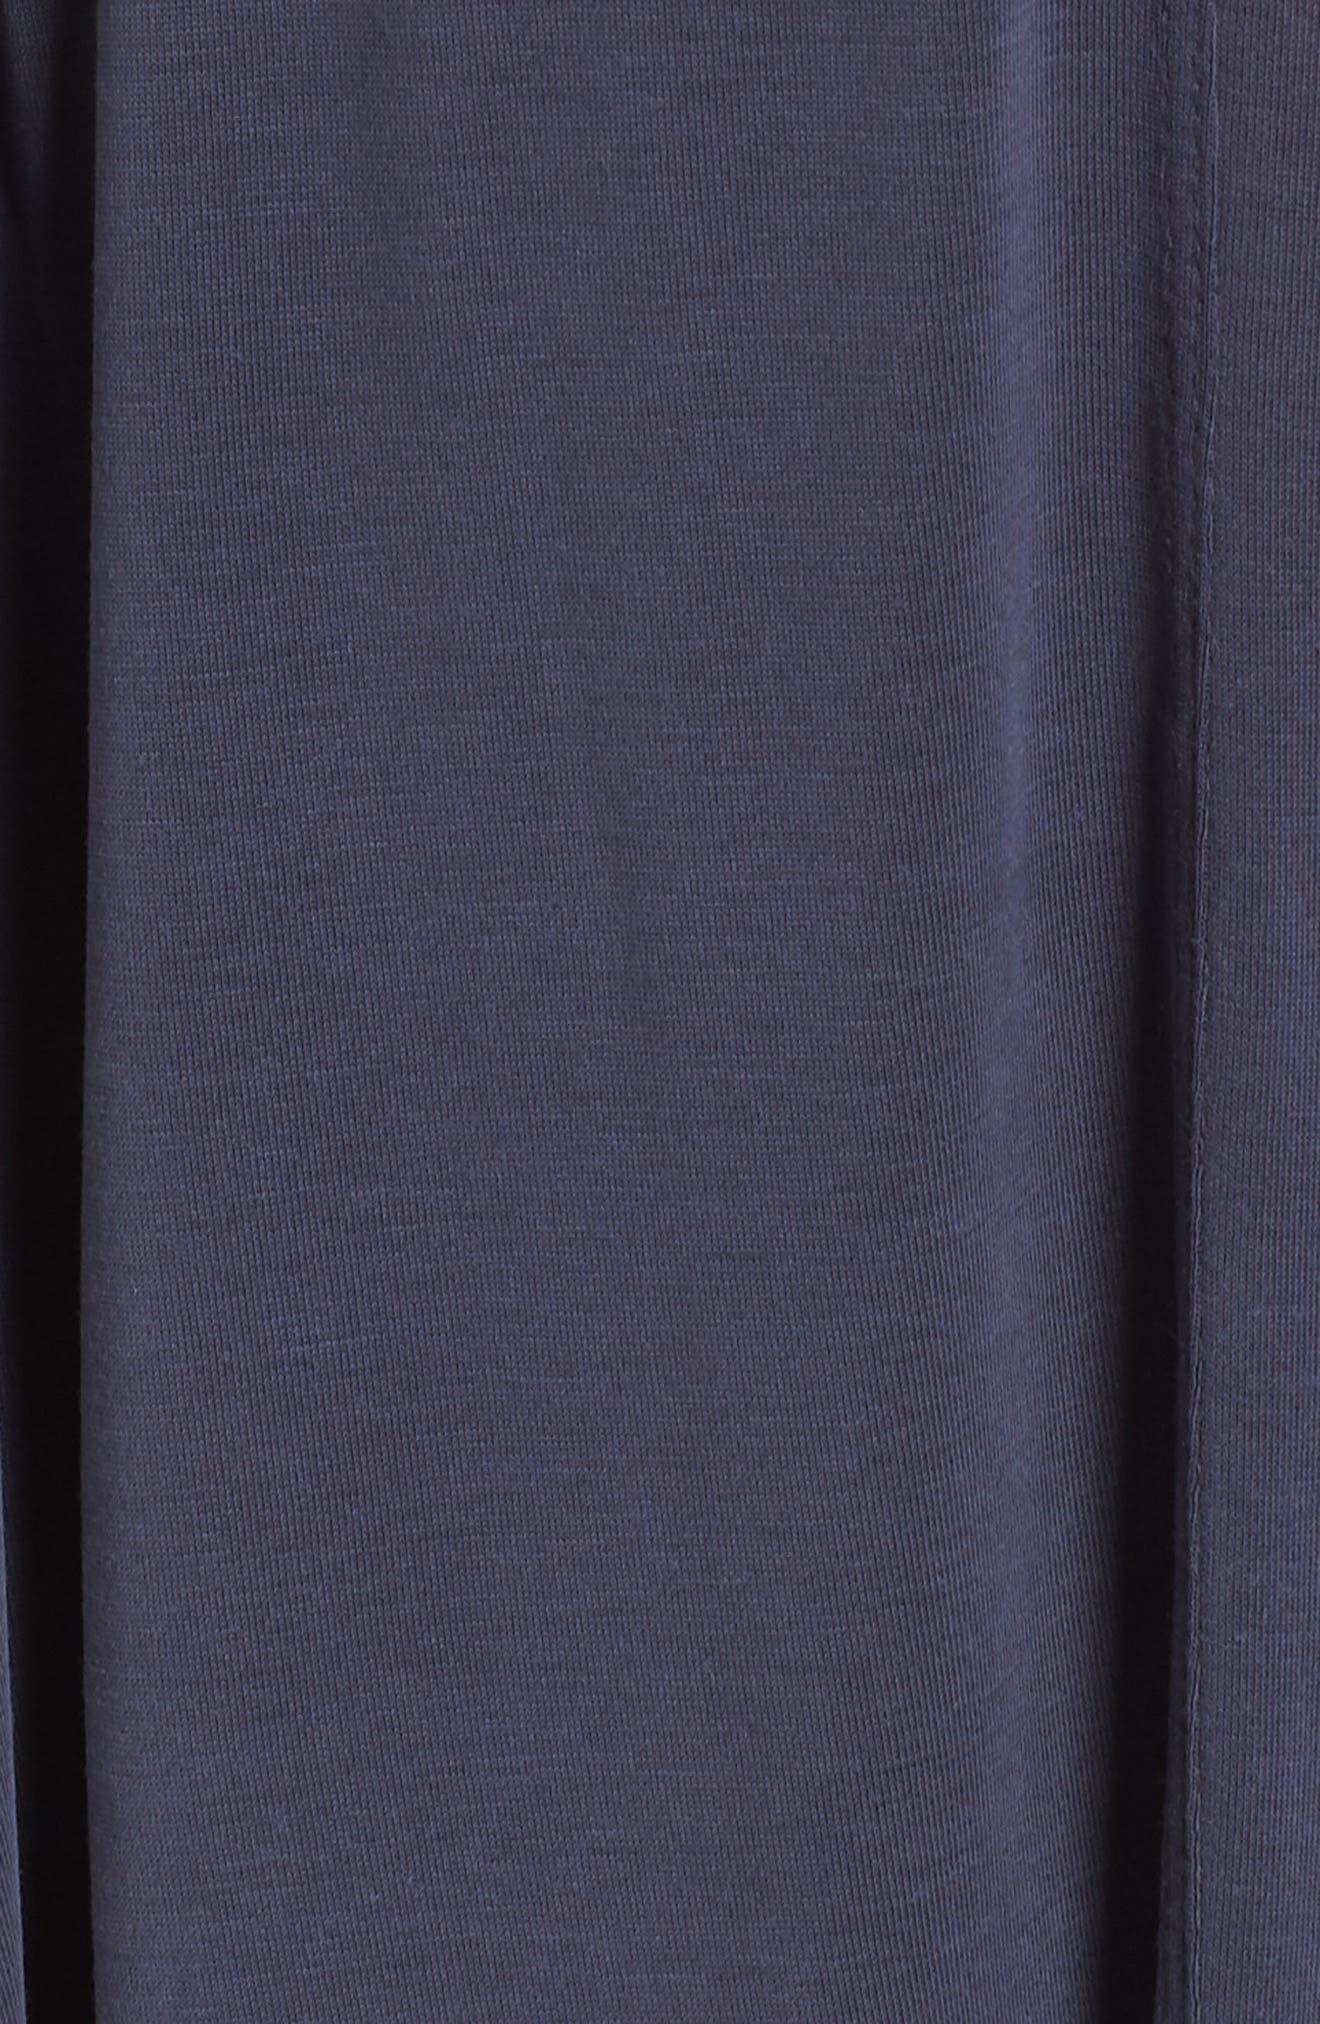 Sandwashed Maxi Dress,                             Alternate thumbnail 6, color,                             Navy